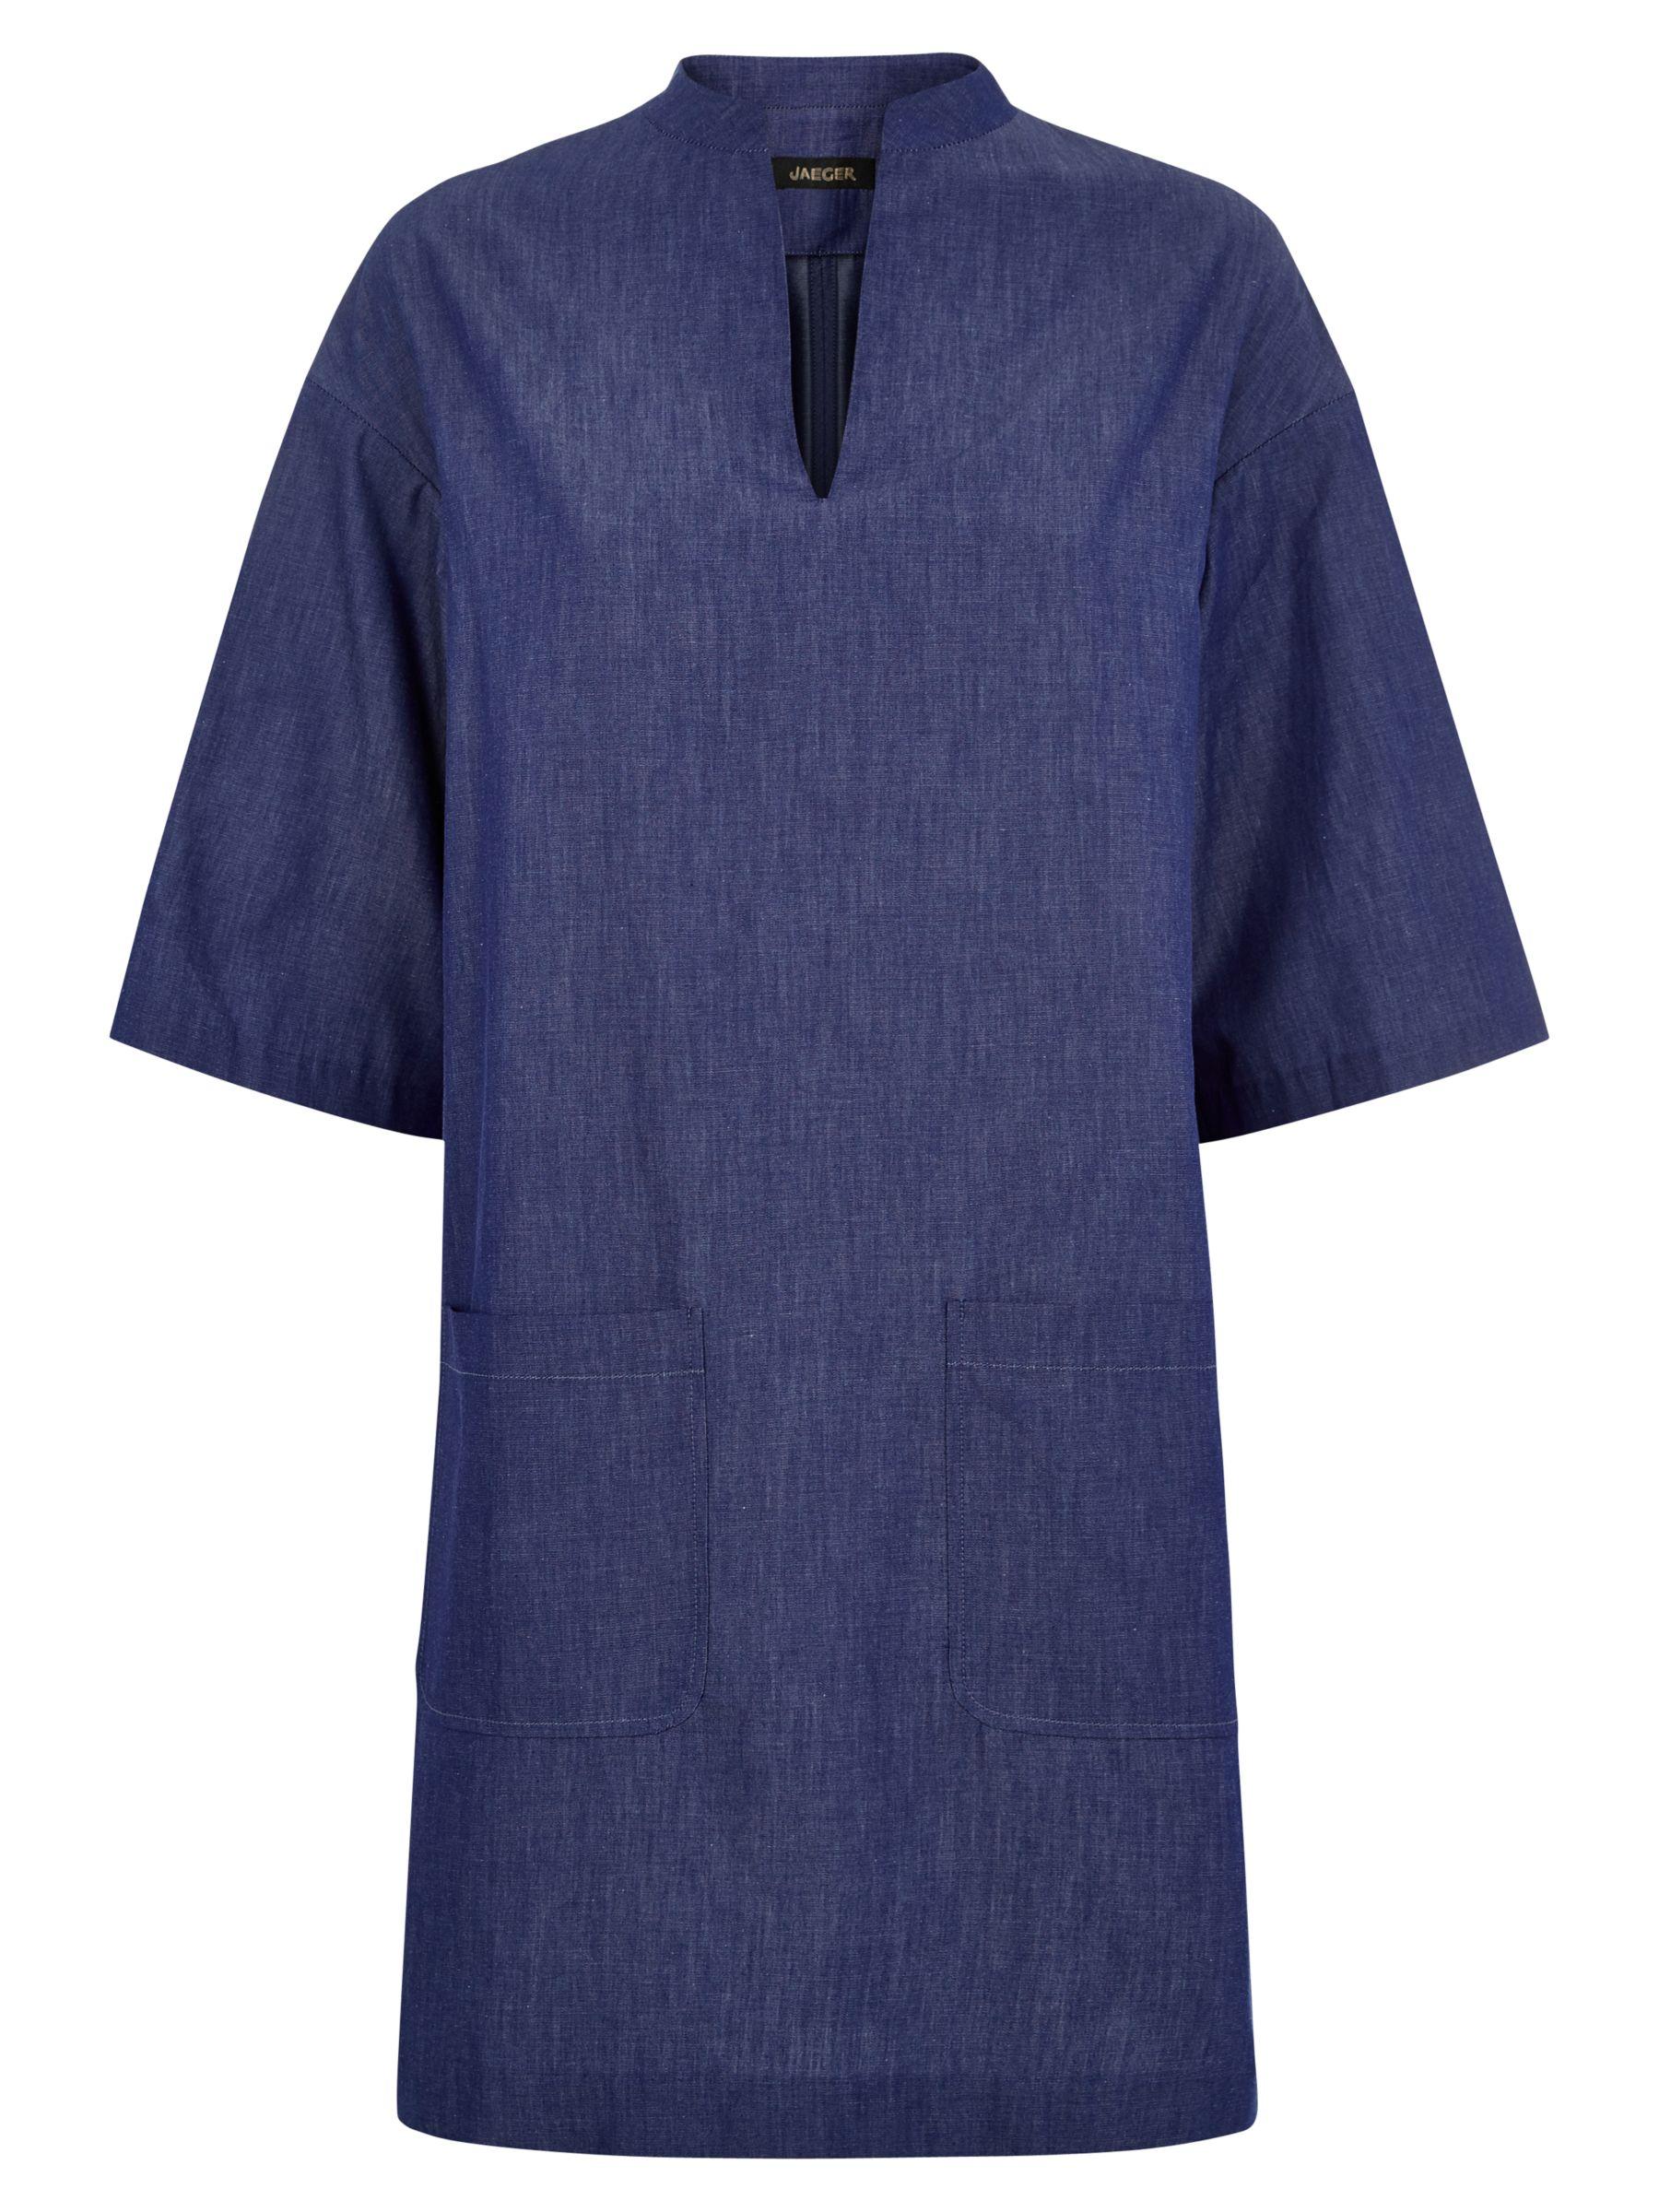 jaeger short sleeved tunic dress chambray, jaeger, short, sleeved, tunic, dress, chambray, 10 14 16 12 18 8 6, edition magazine, blue day, fashion magazine, denim luxe, women, womens dresses, 1853645